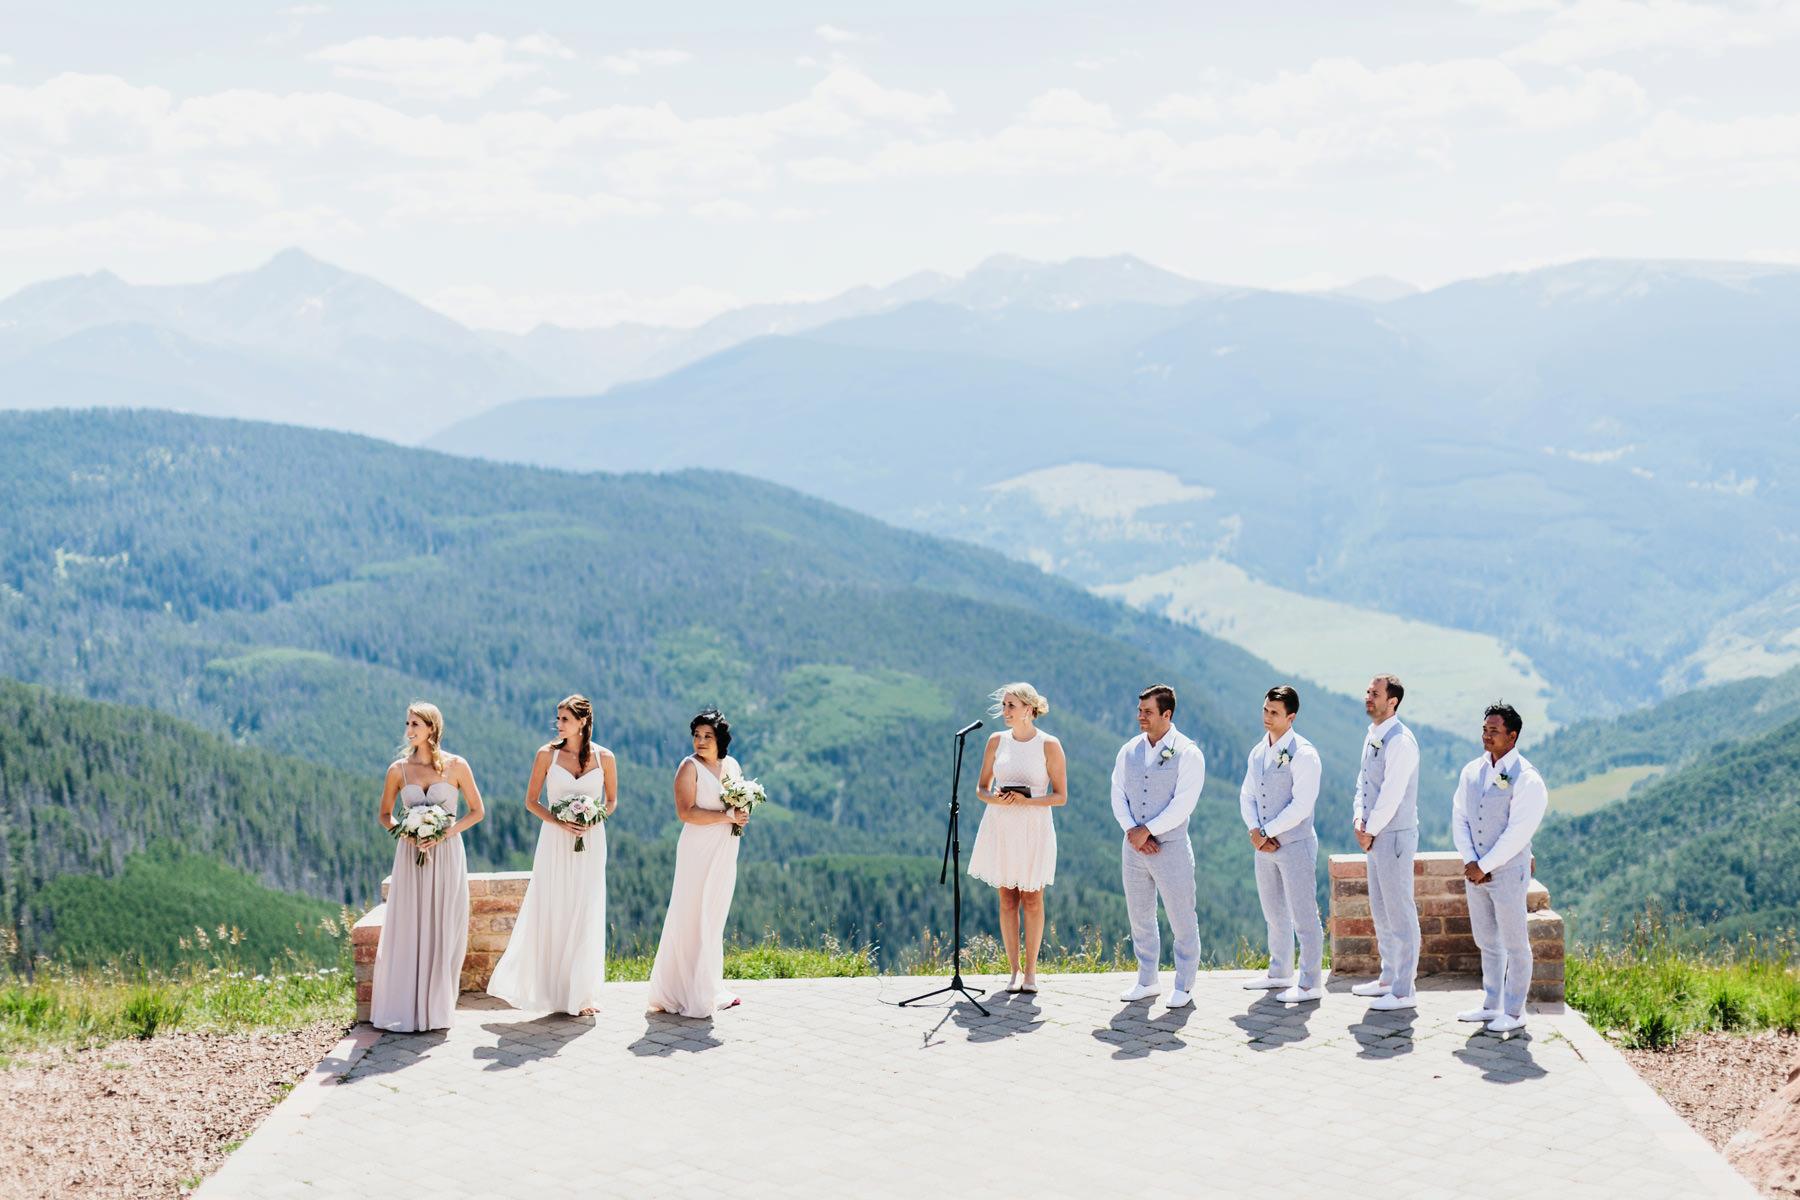 Vail Colorado Wedding Deck_ Kindling Wedding Photography31.JPG